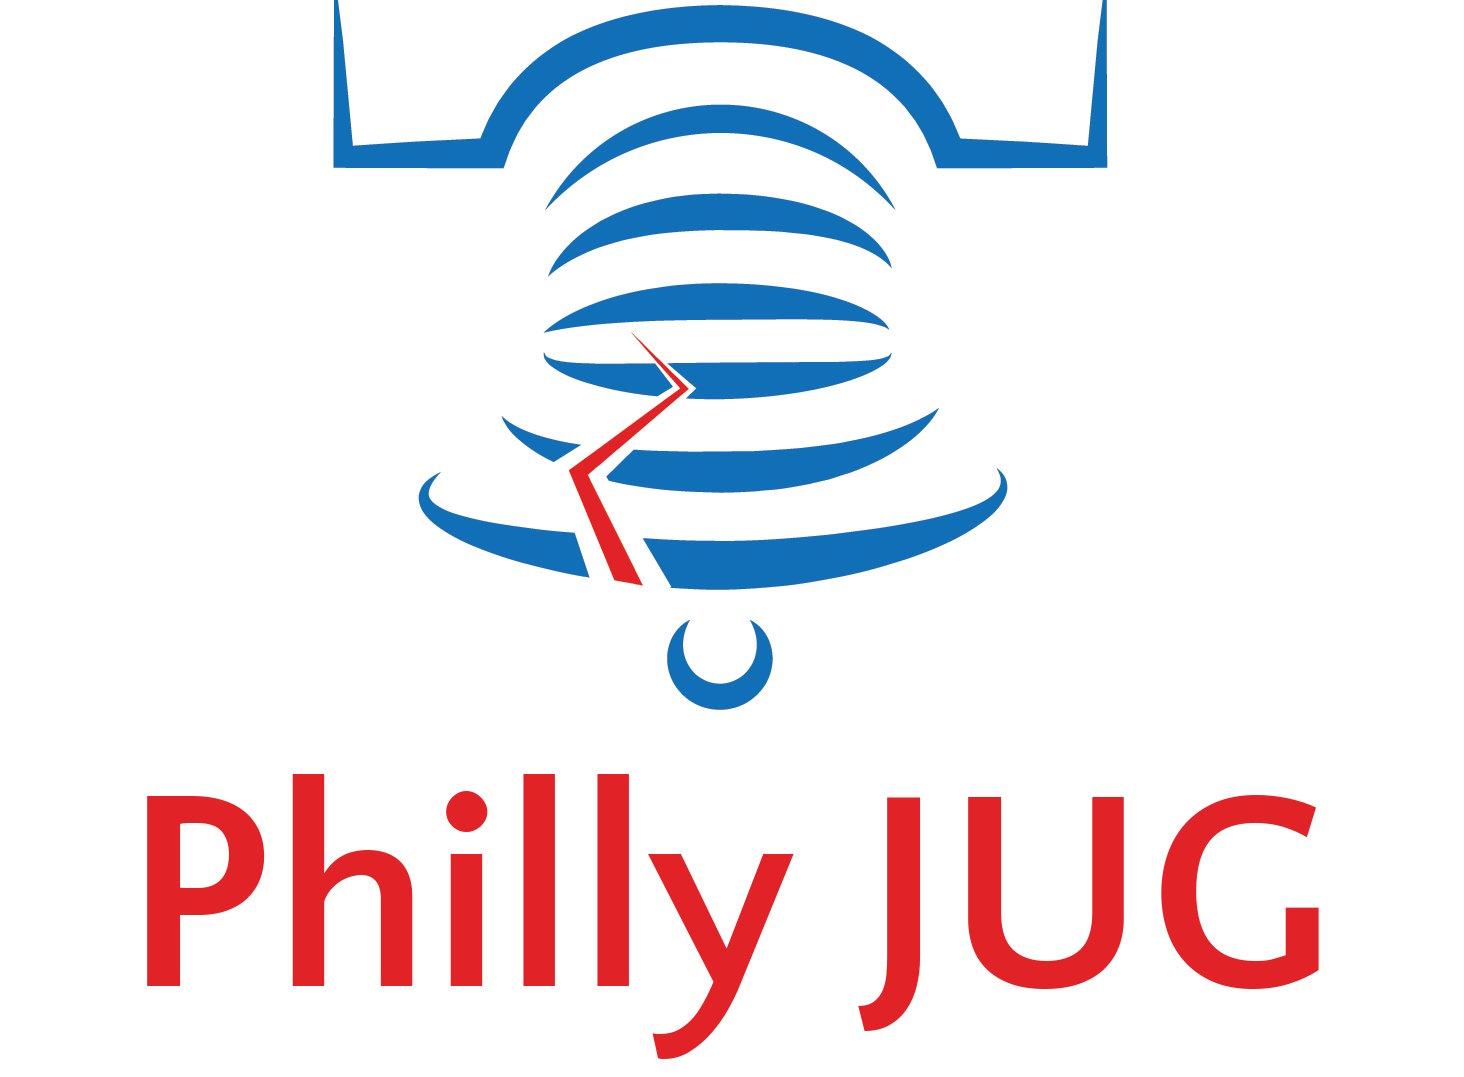 Philly_Jug.jpeg